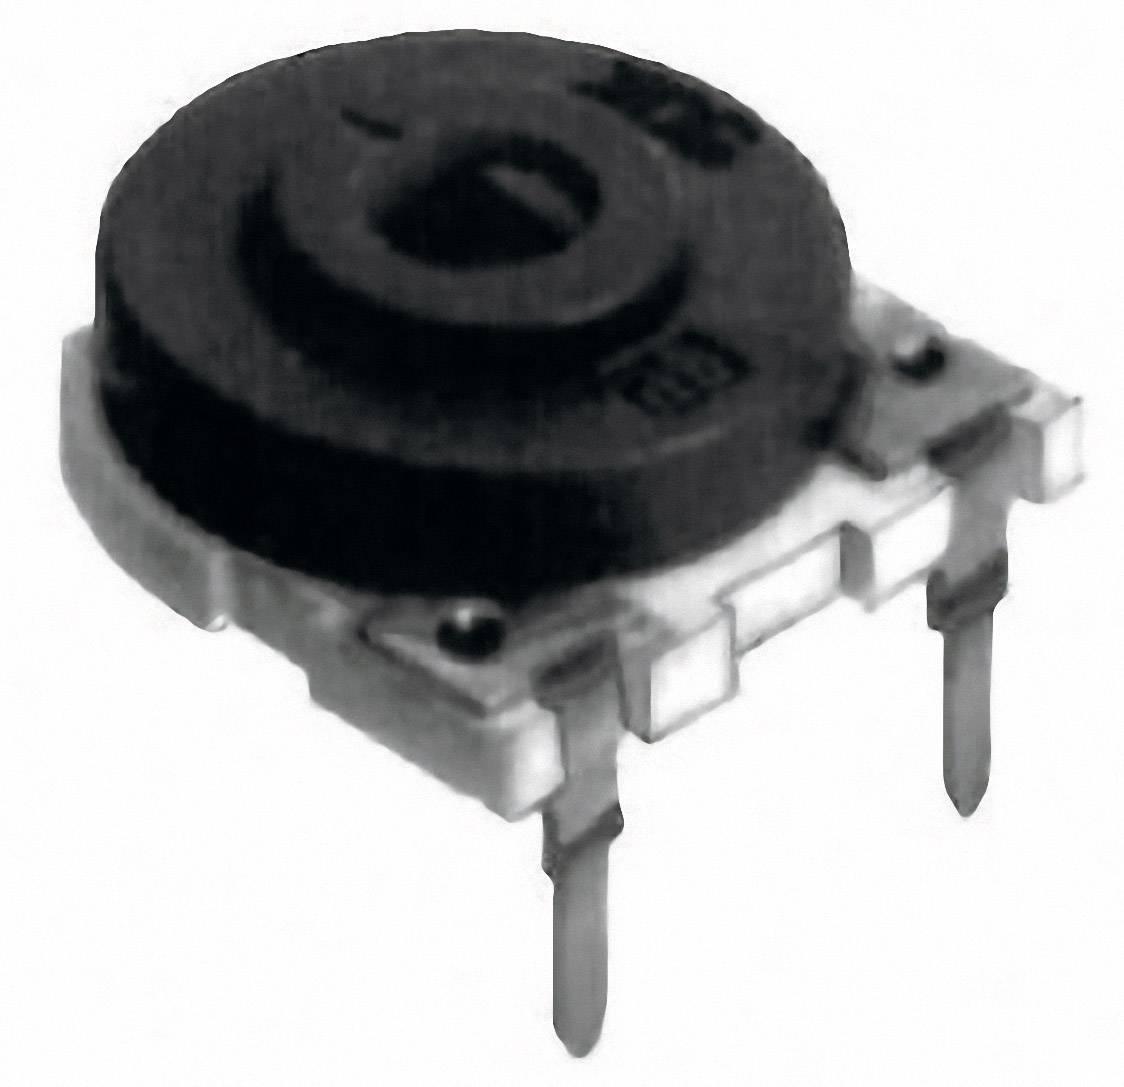 Cermetový trimer TT Electro, 2041460905, 1 kΩ, 0.5 W, ± 20%